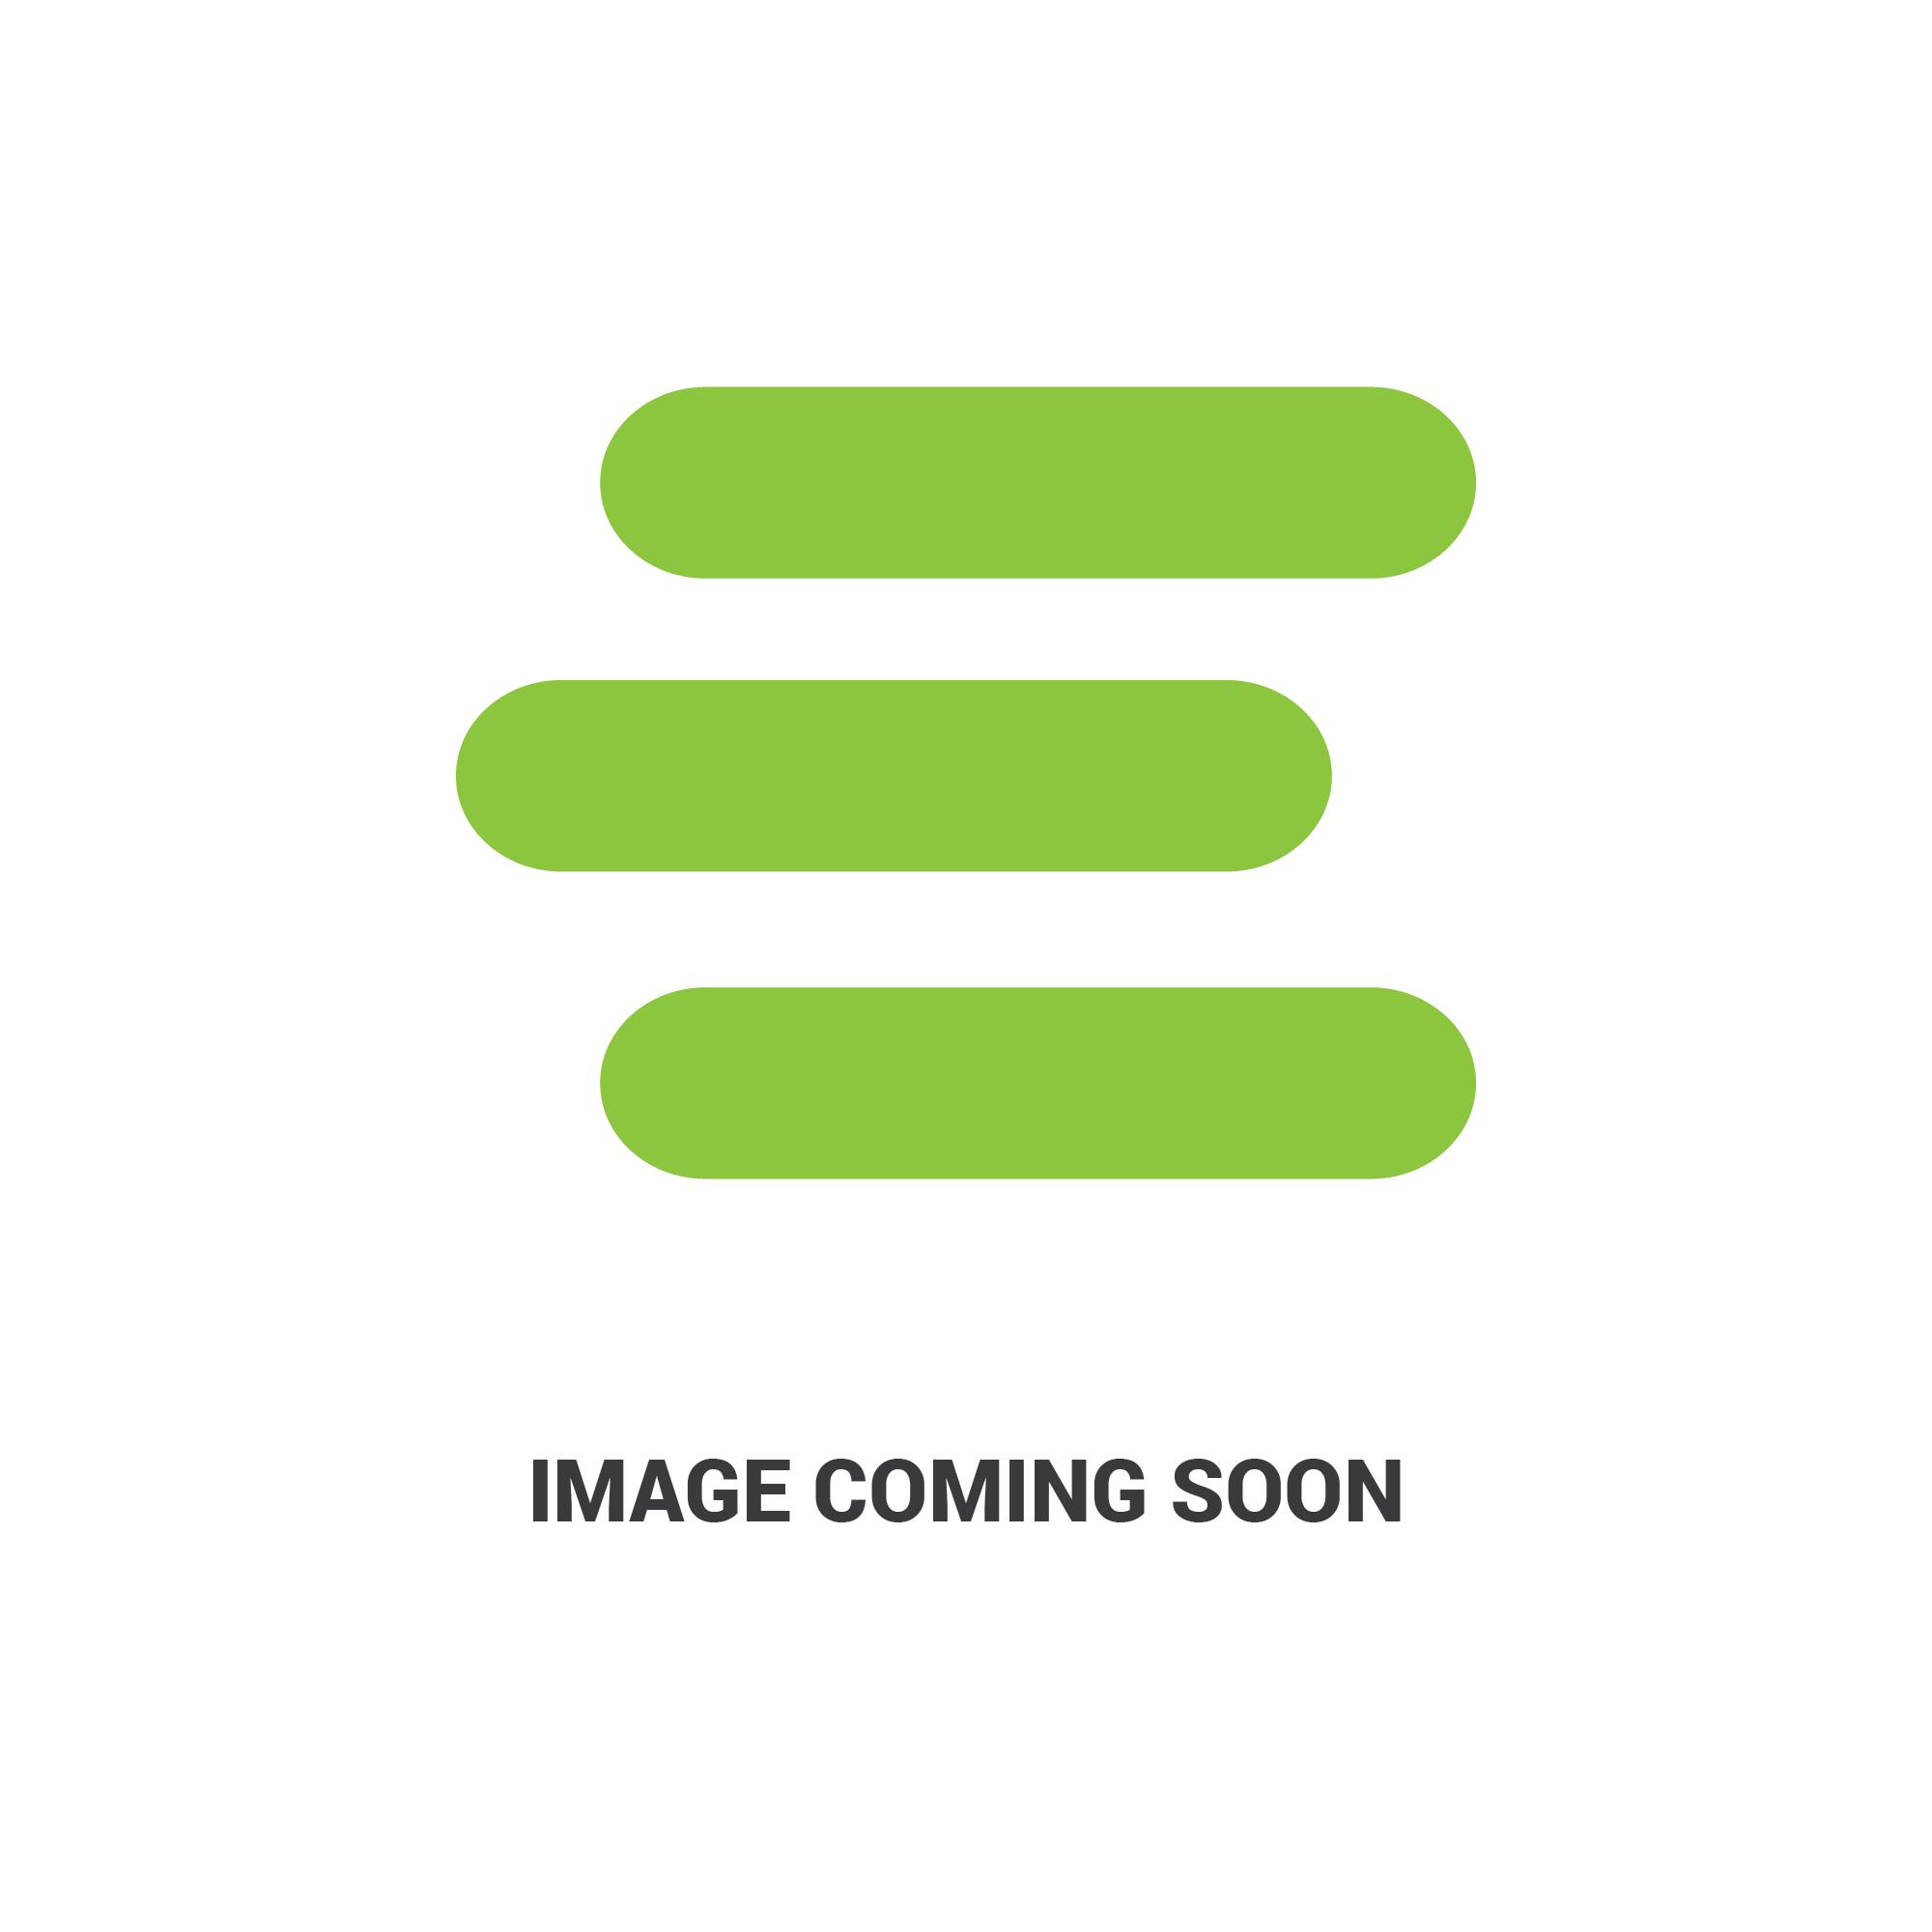 E-17121-52030edit 1.jpg